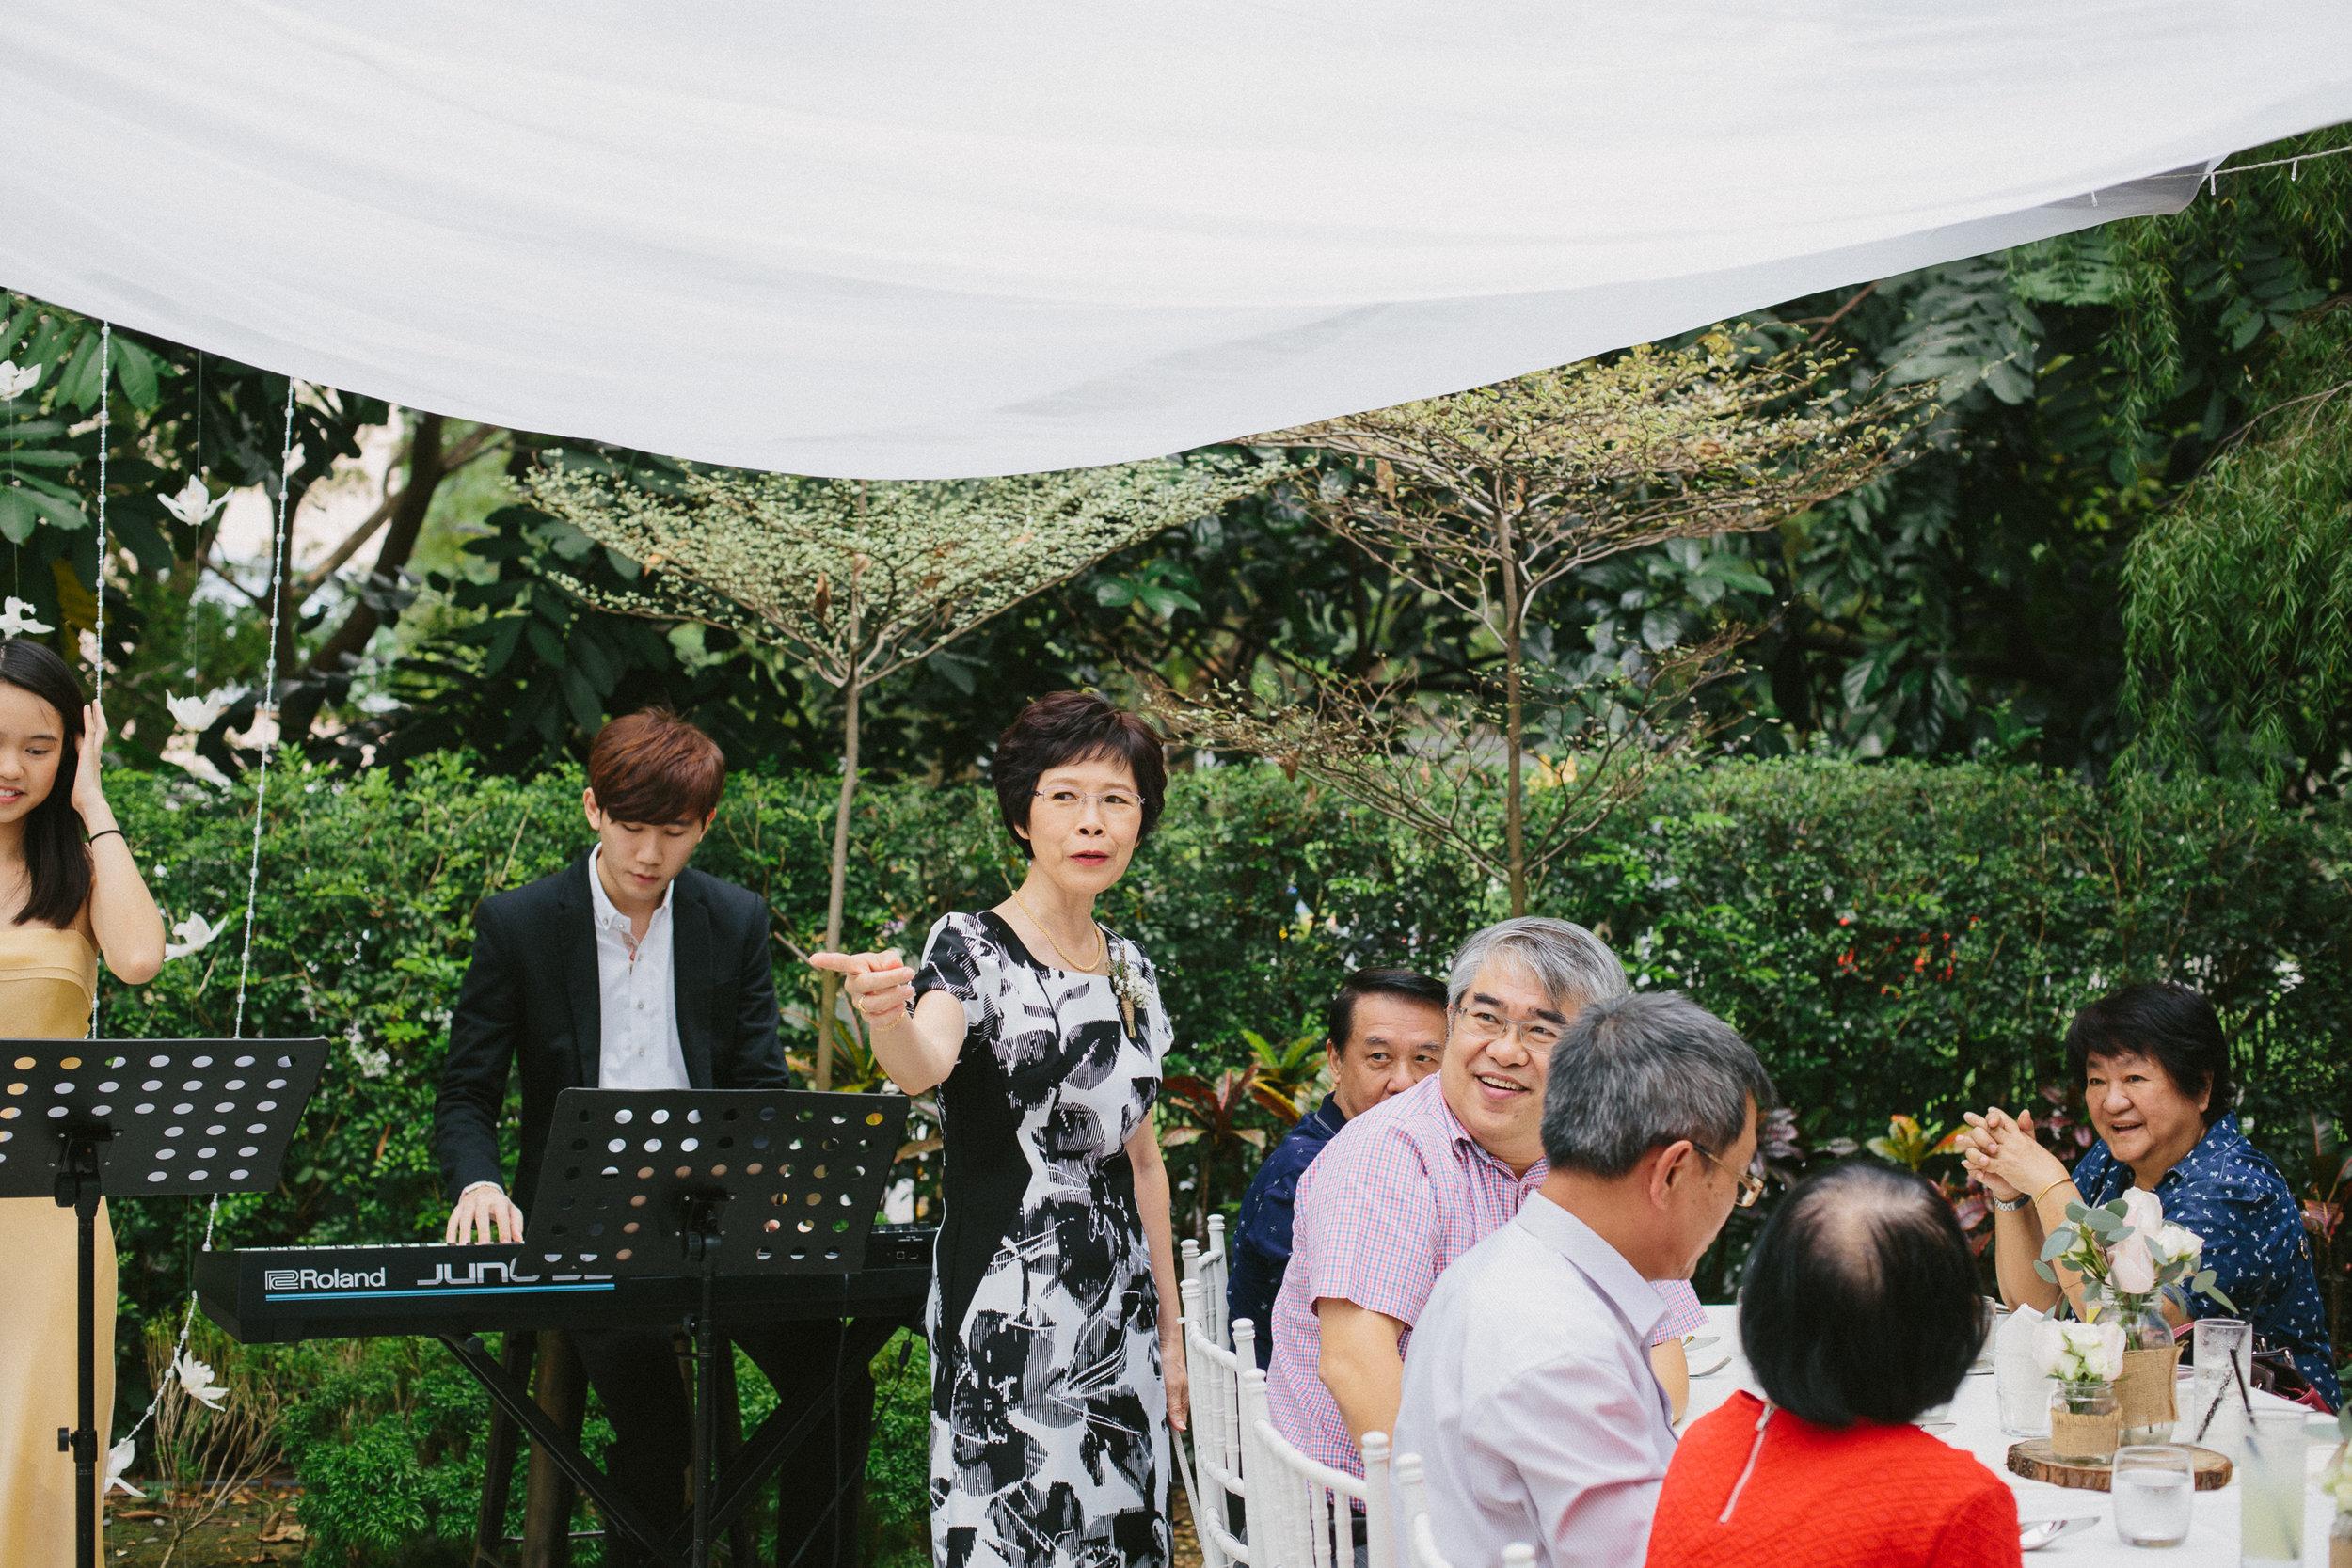 singapore-wedding-photographer-fadilah-kwan-025.jpg